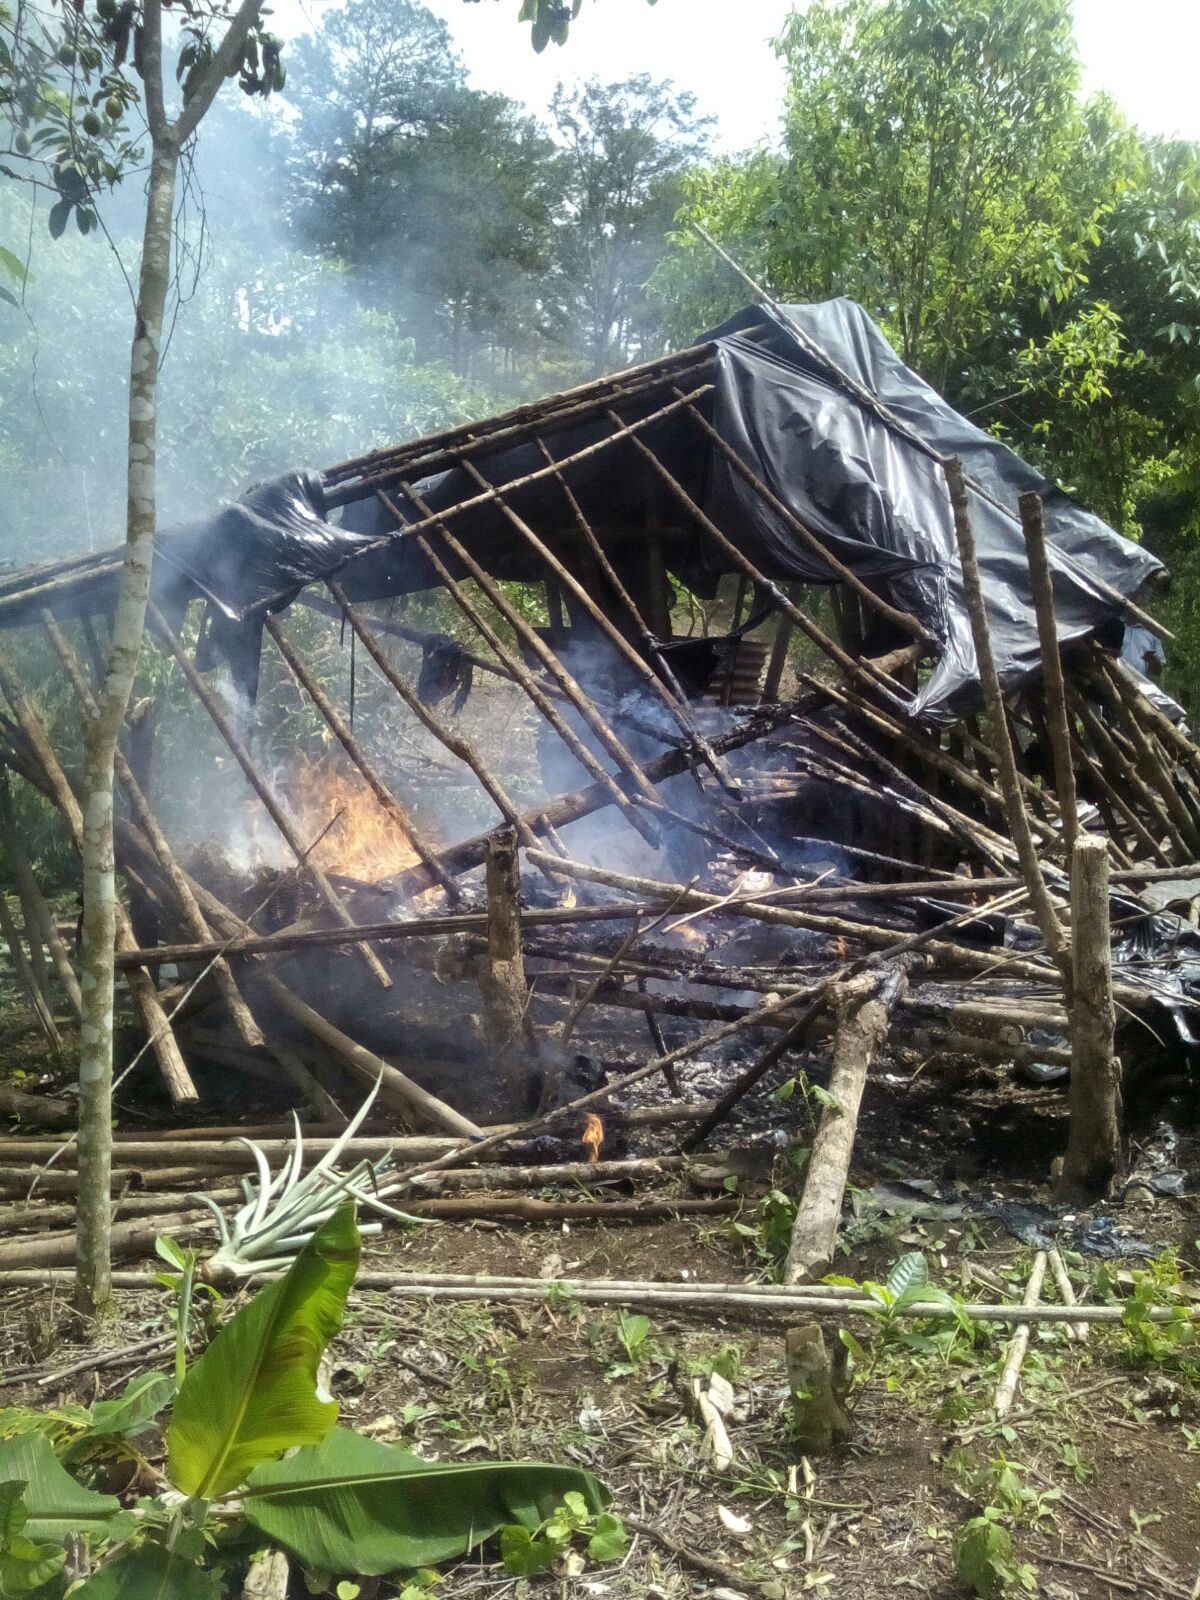 Desalojan a varias familiares que habían invadido unos terrenos en Santa Cruz de Yojoa - http://bit.ly/1jPizWl